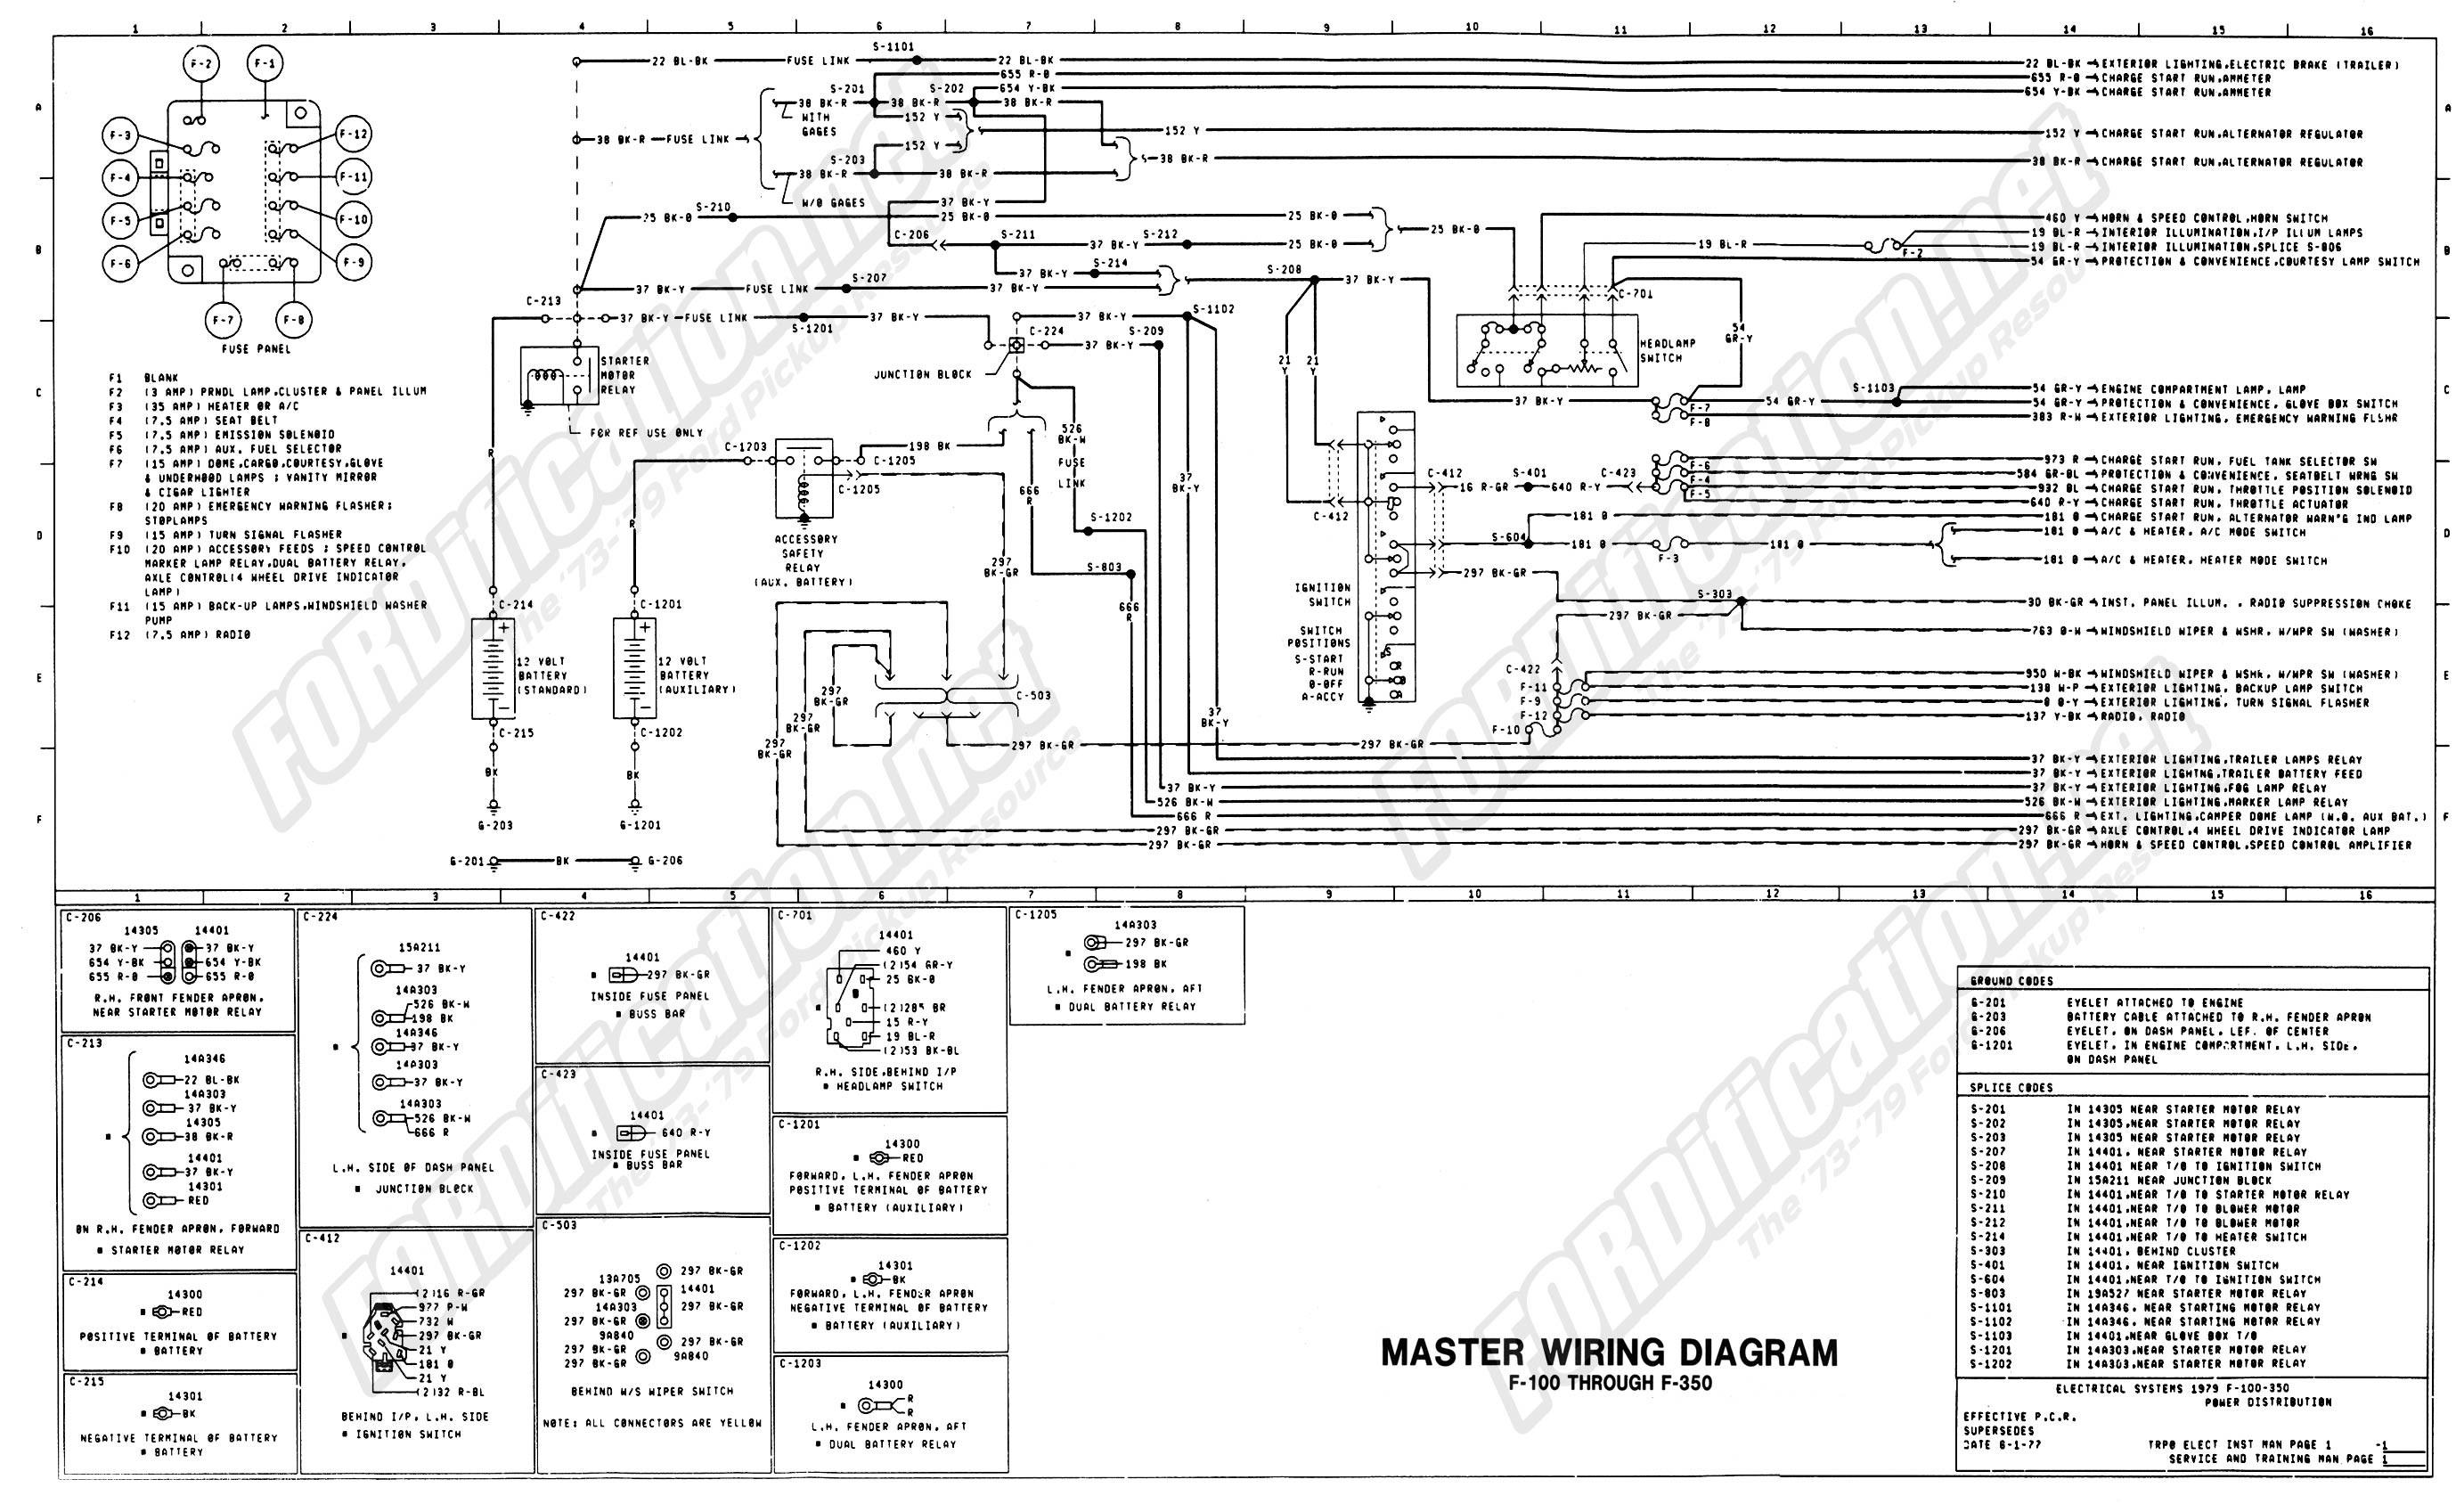 2018 F650 Wiring Diagram 2001 F350 Wiring Diagram Wiring Diagram Data Of 2018 F650 Wiring Diagram